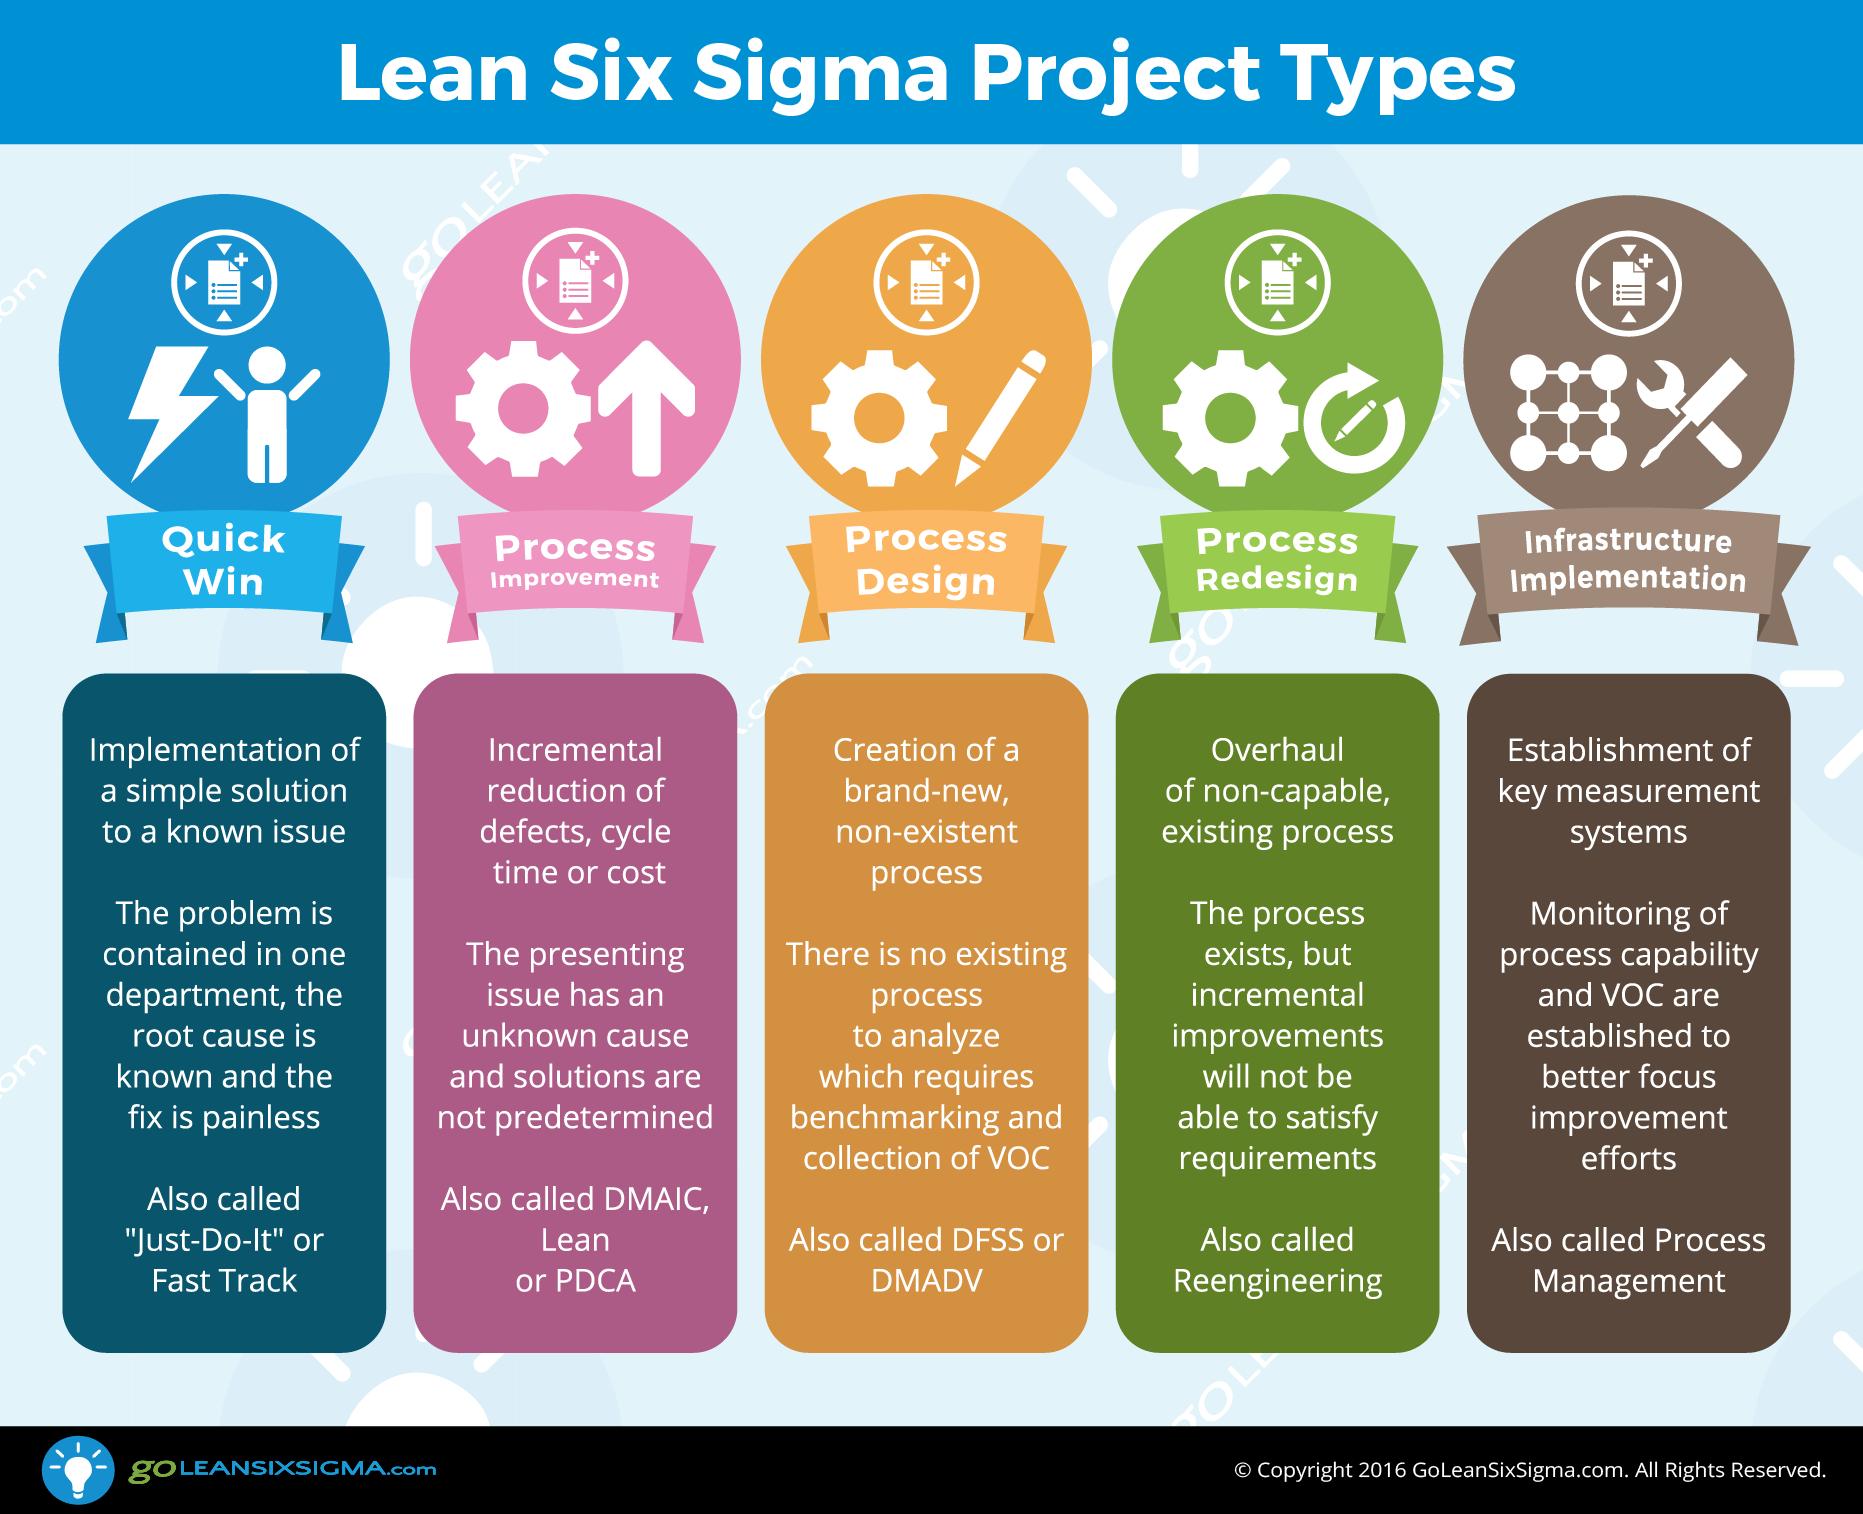 5 Lean Six Sigma Project Types Lean Six Sigma Lean Sigma